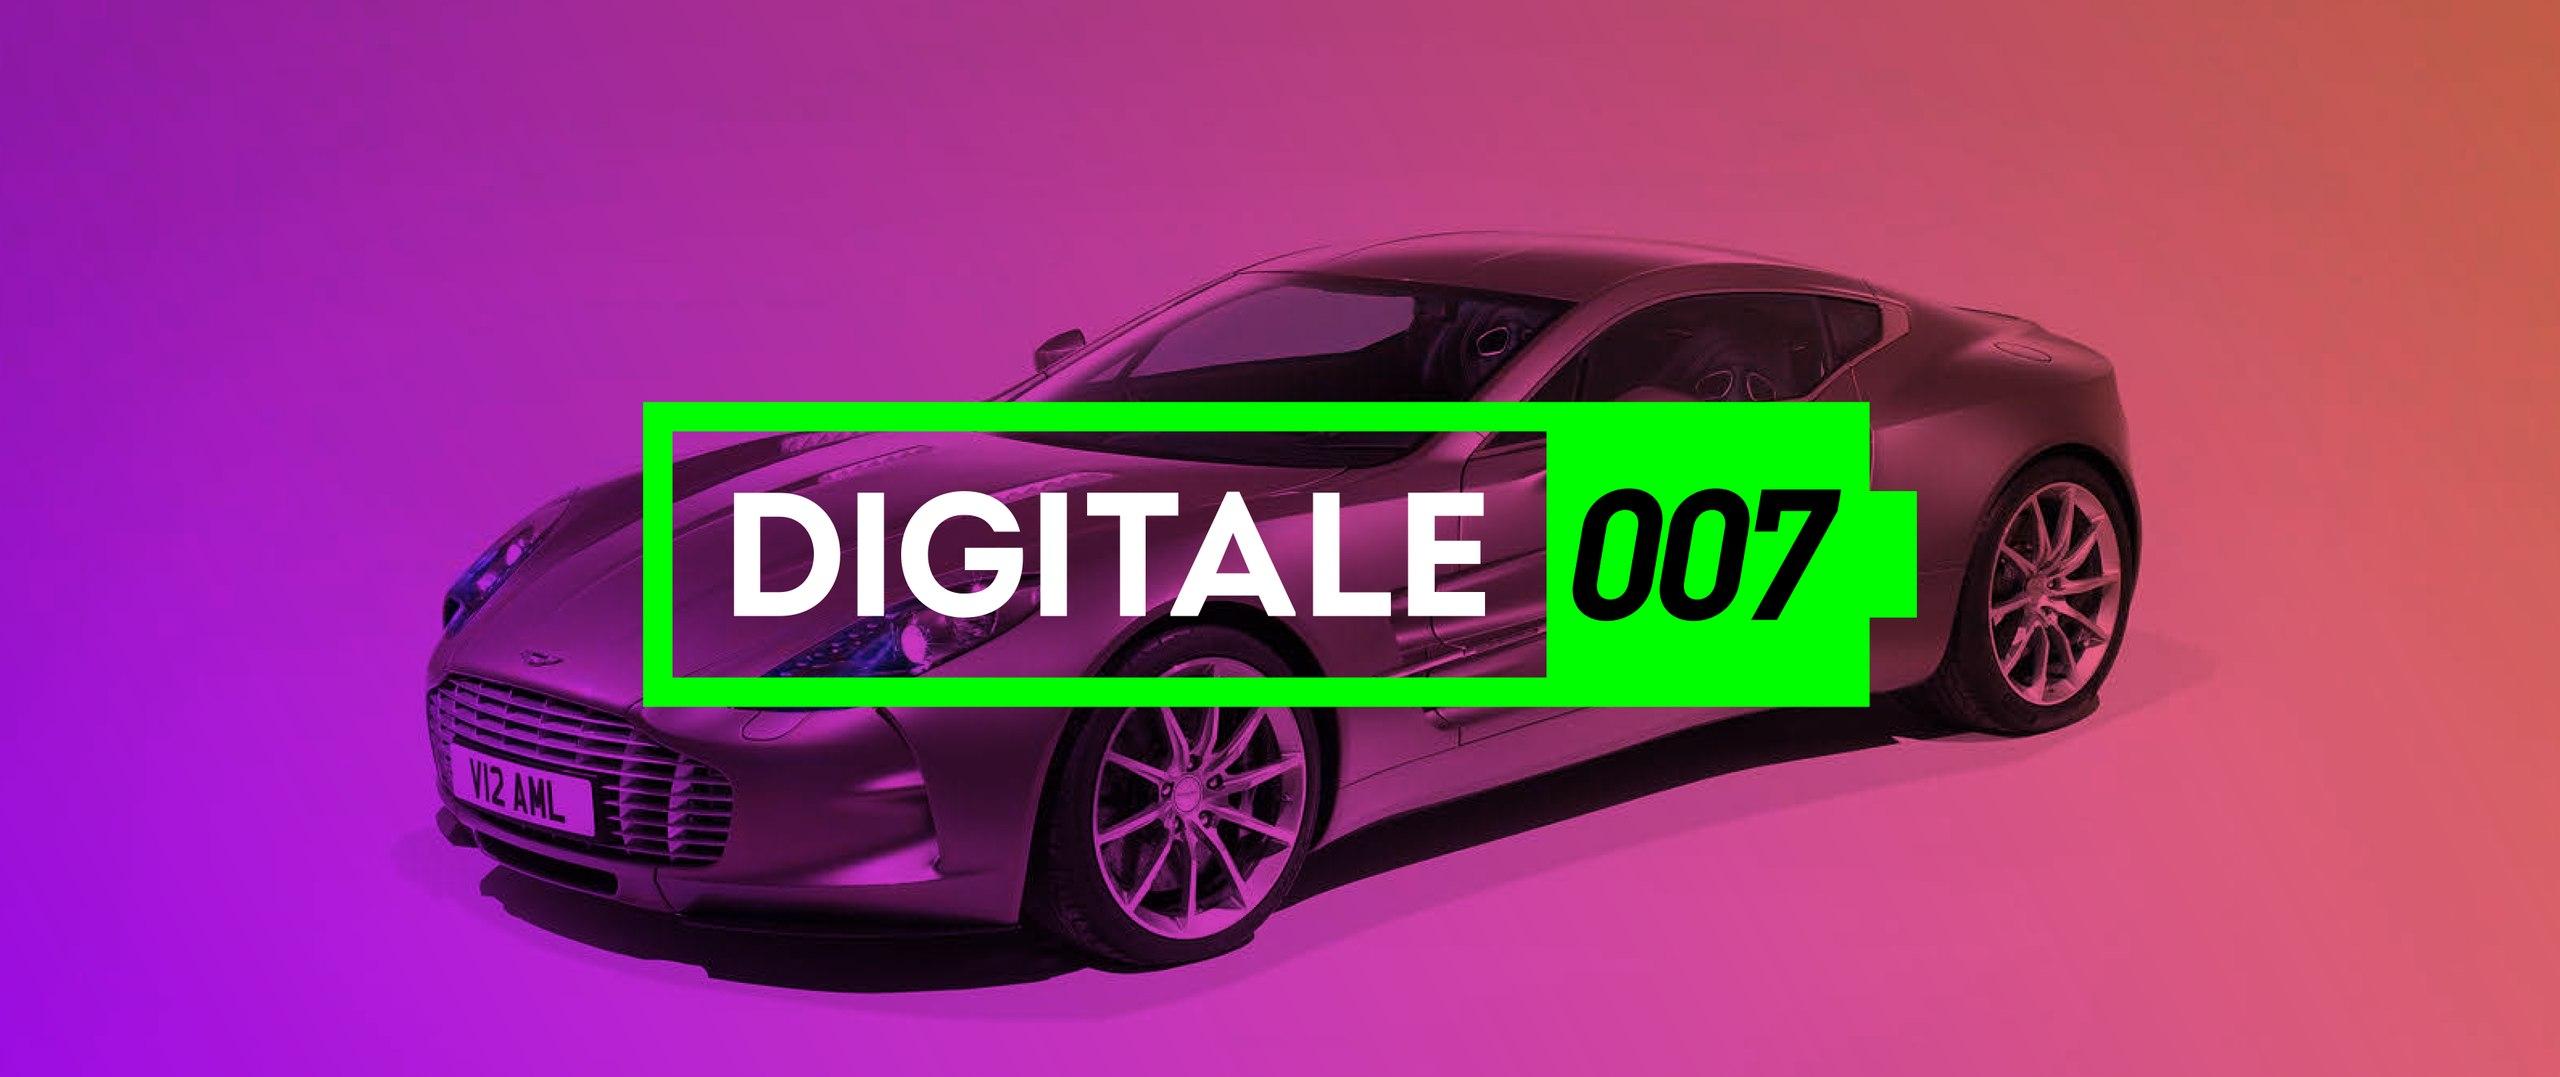 Digitale 007 ? конференция по маркетингу №1 в Петербурге